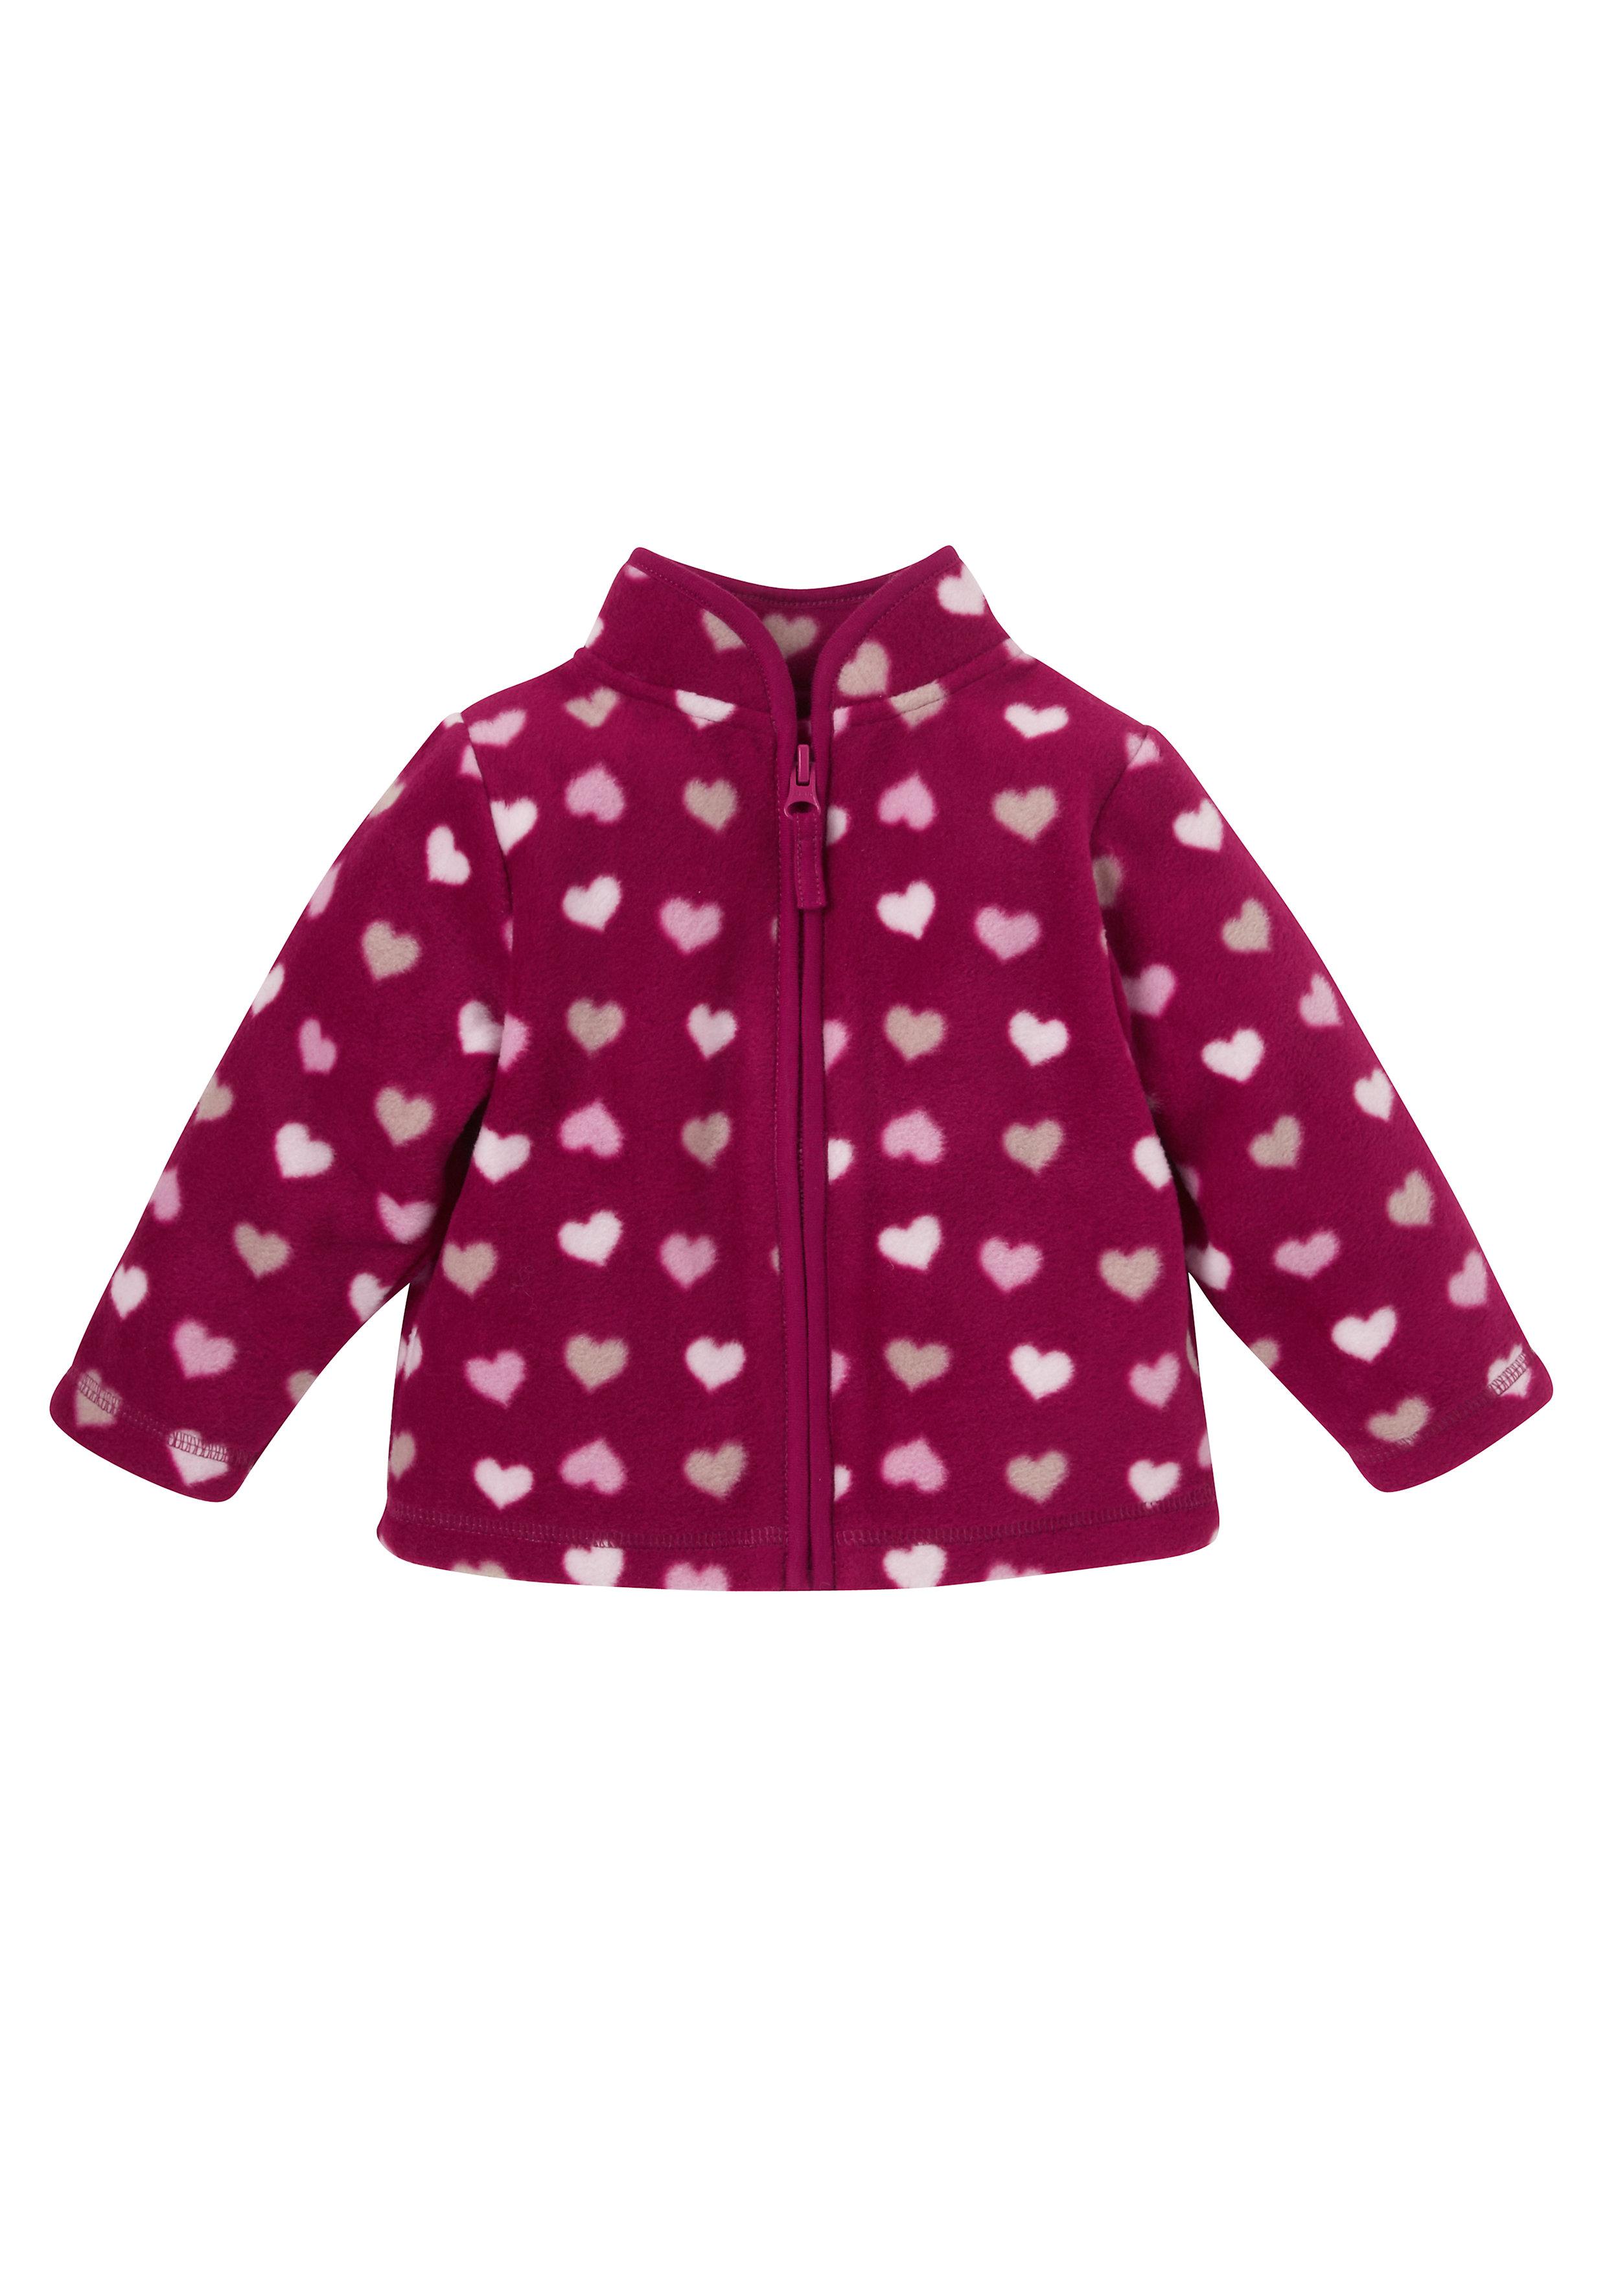 Mothercare | Girls Full Sleeves Fleece Jacket Heart Design - Pink